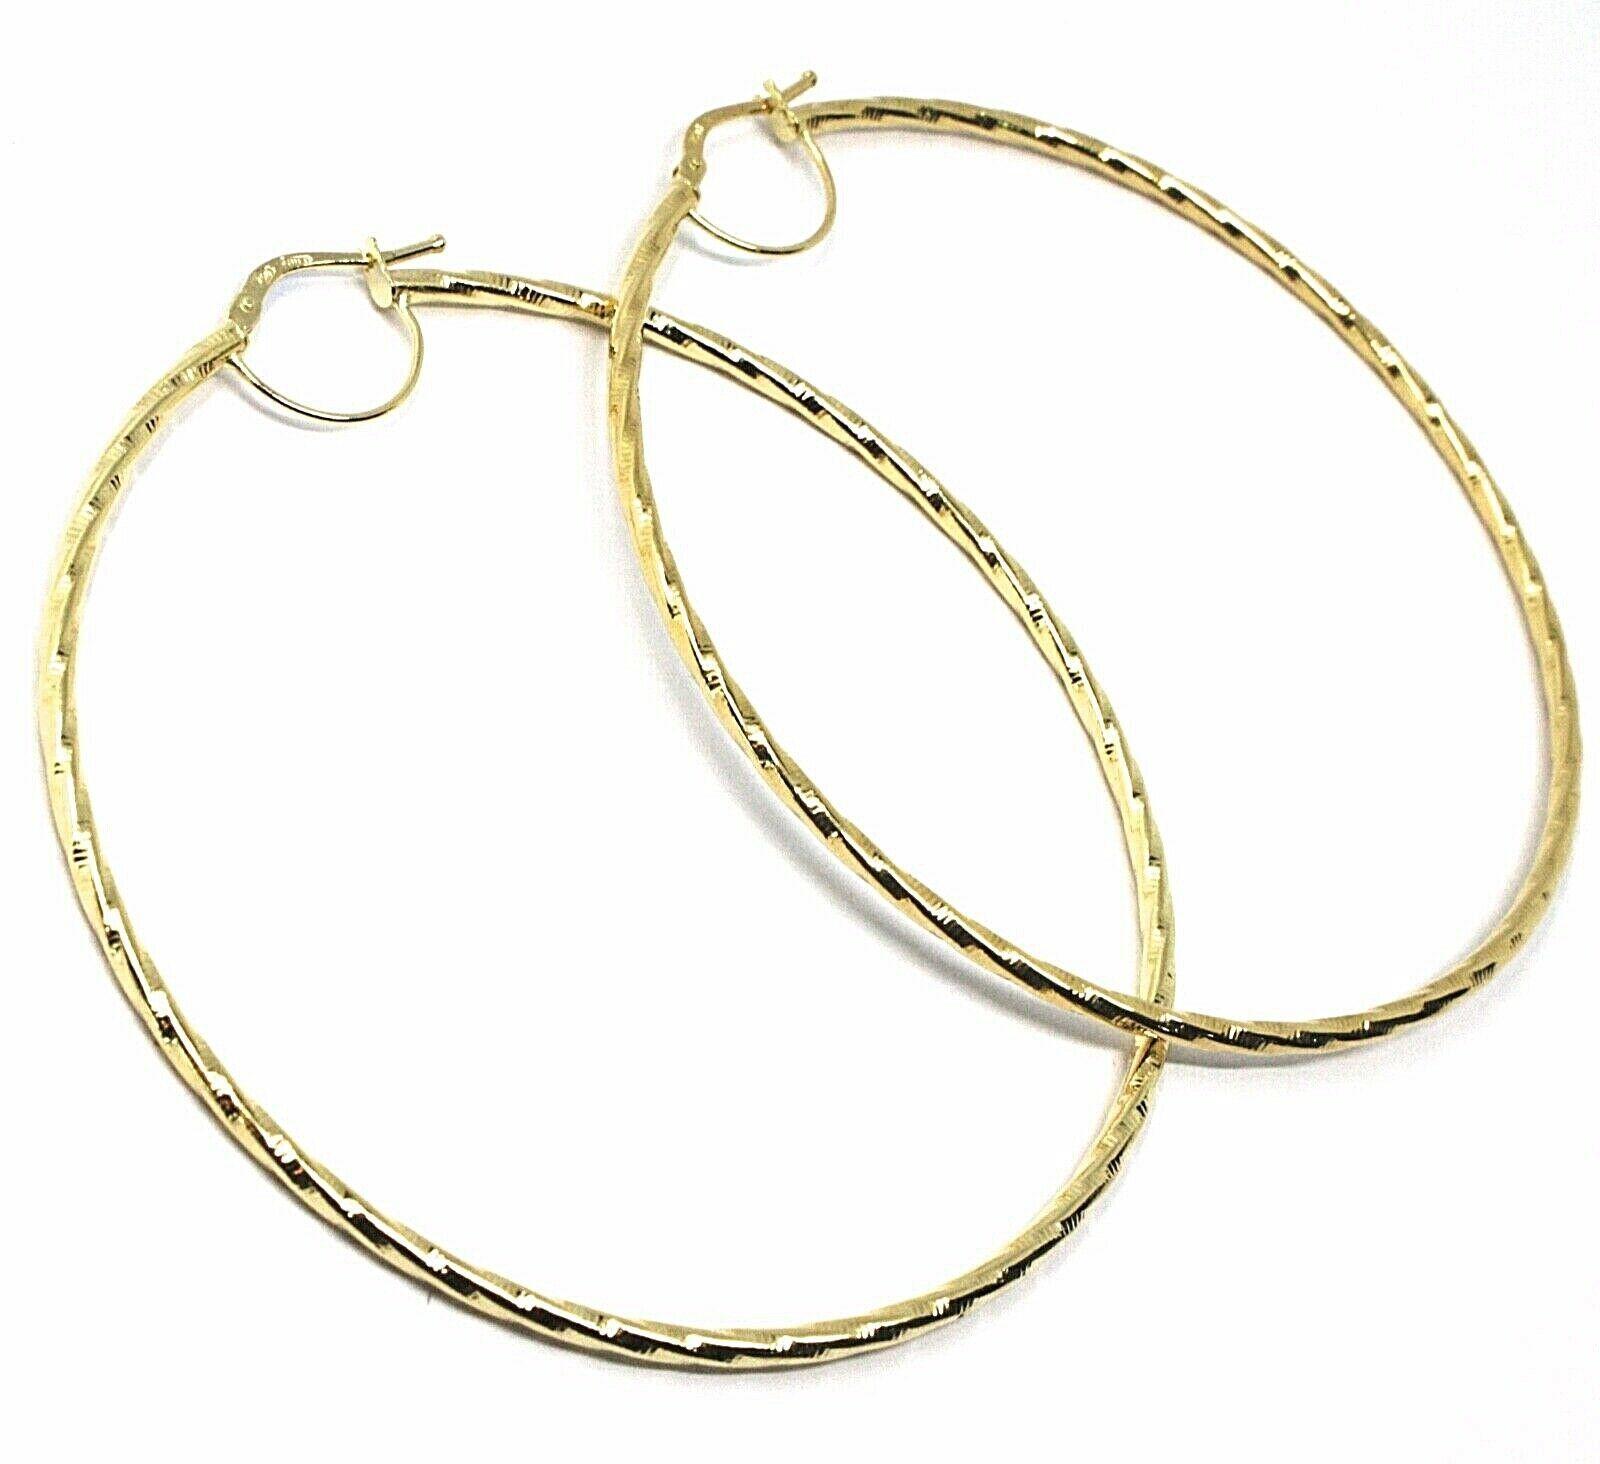 18K YELLOW GOLD BIG CIRCLE HOOPS DIAMETER 65mm EARRINGS TUBE 2mm BRAIDED STRIPED